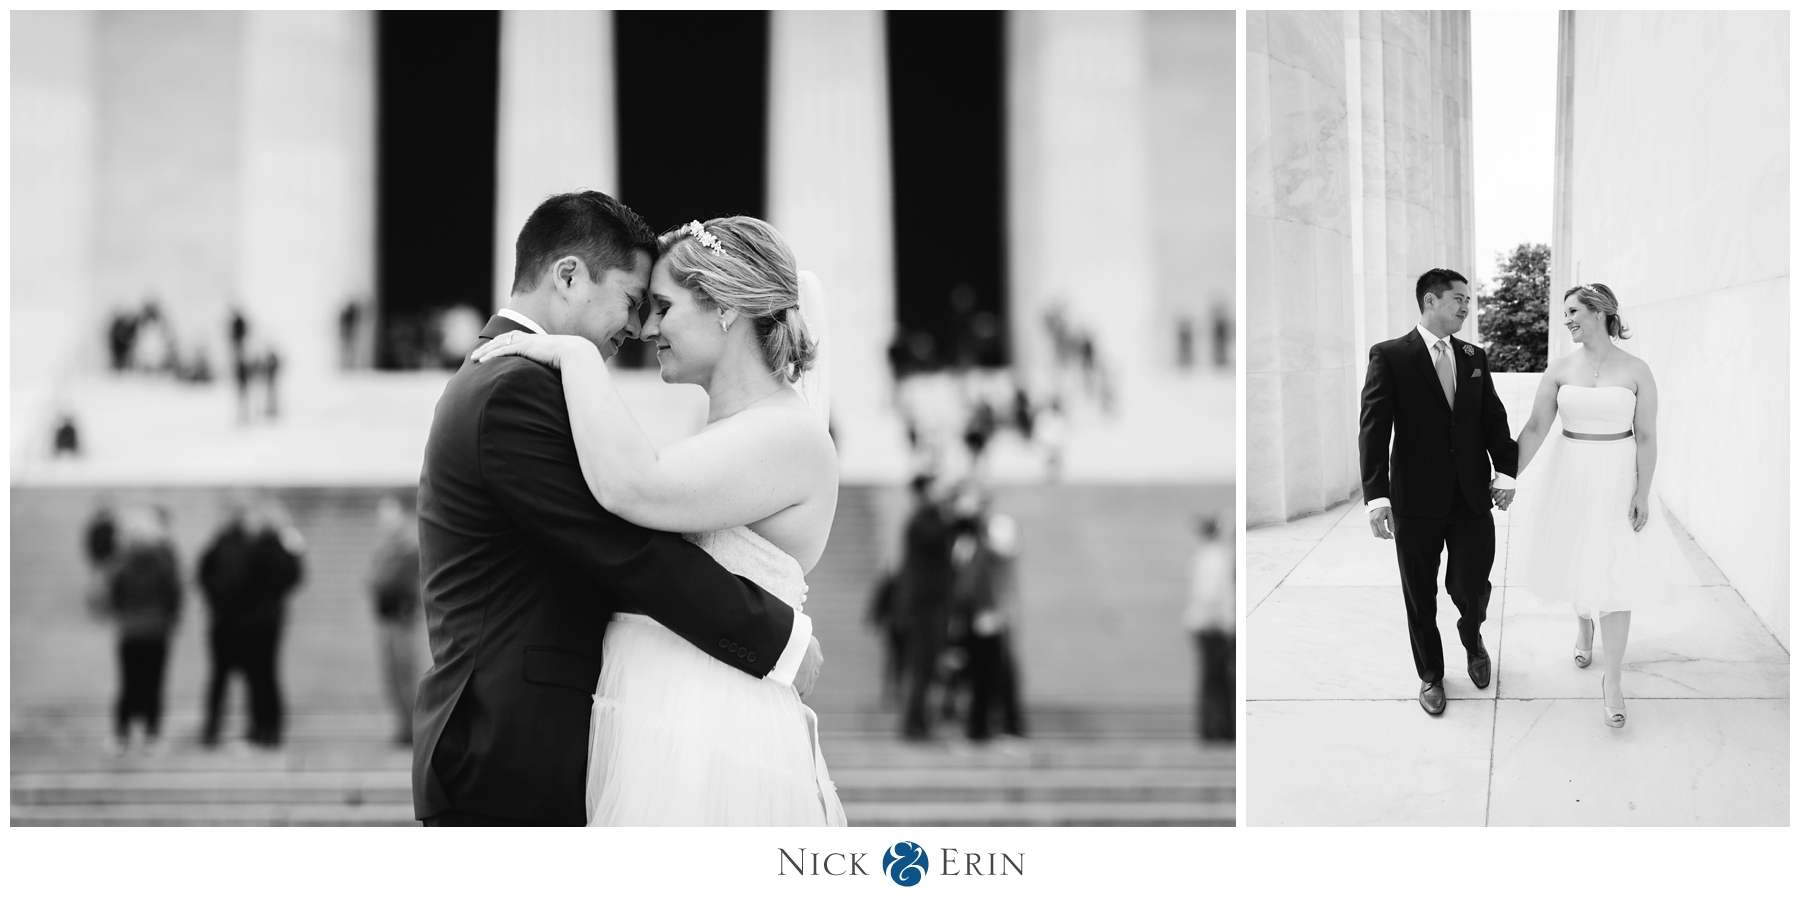 Donner_Photography_Washington DC Wedding_Lincoln Monument_Jen & Jon_0006